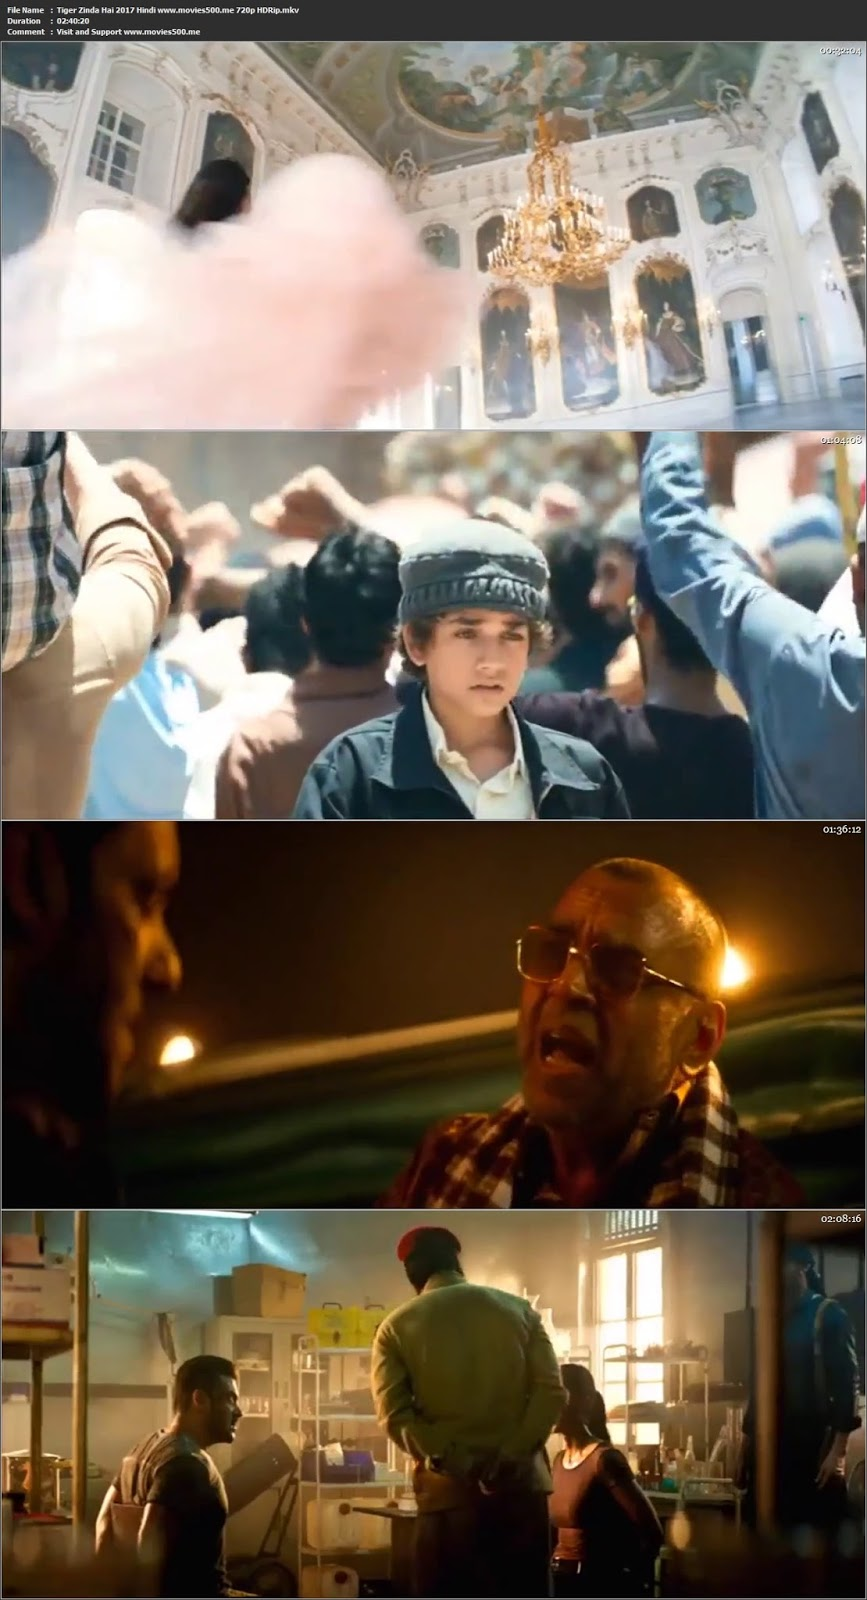 Tiger Zinda Hai 2017 Hindi Full Movie HDRip 720p 1GB at newbtcbank.com